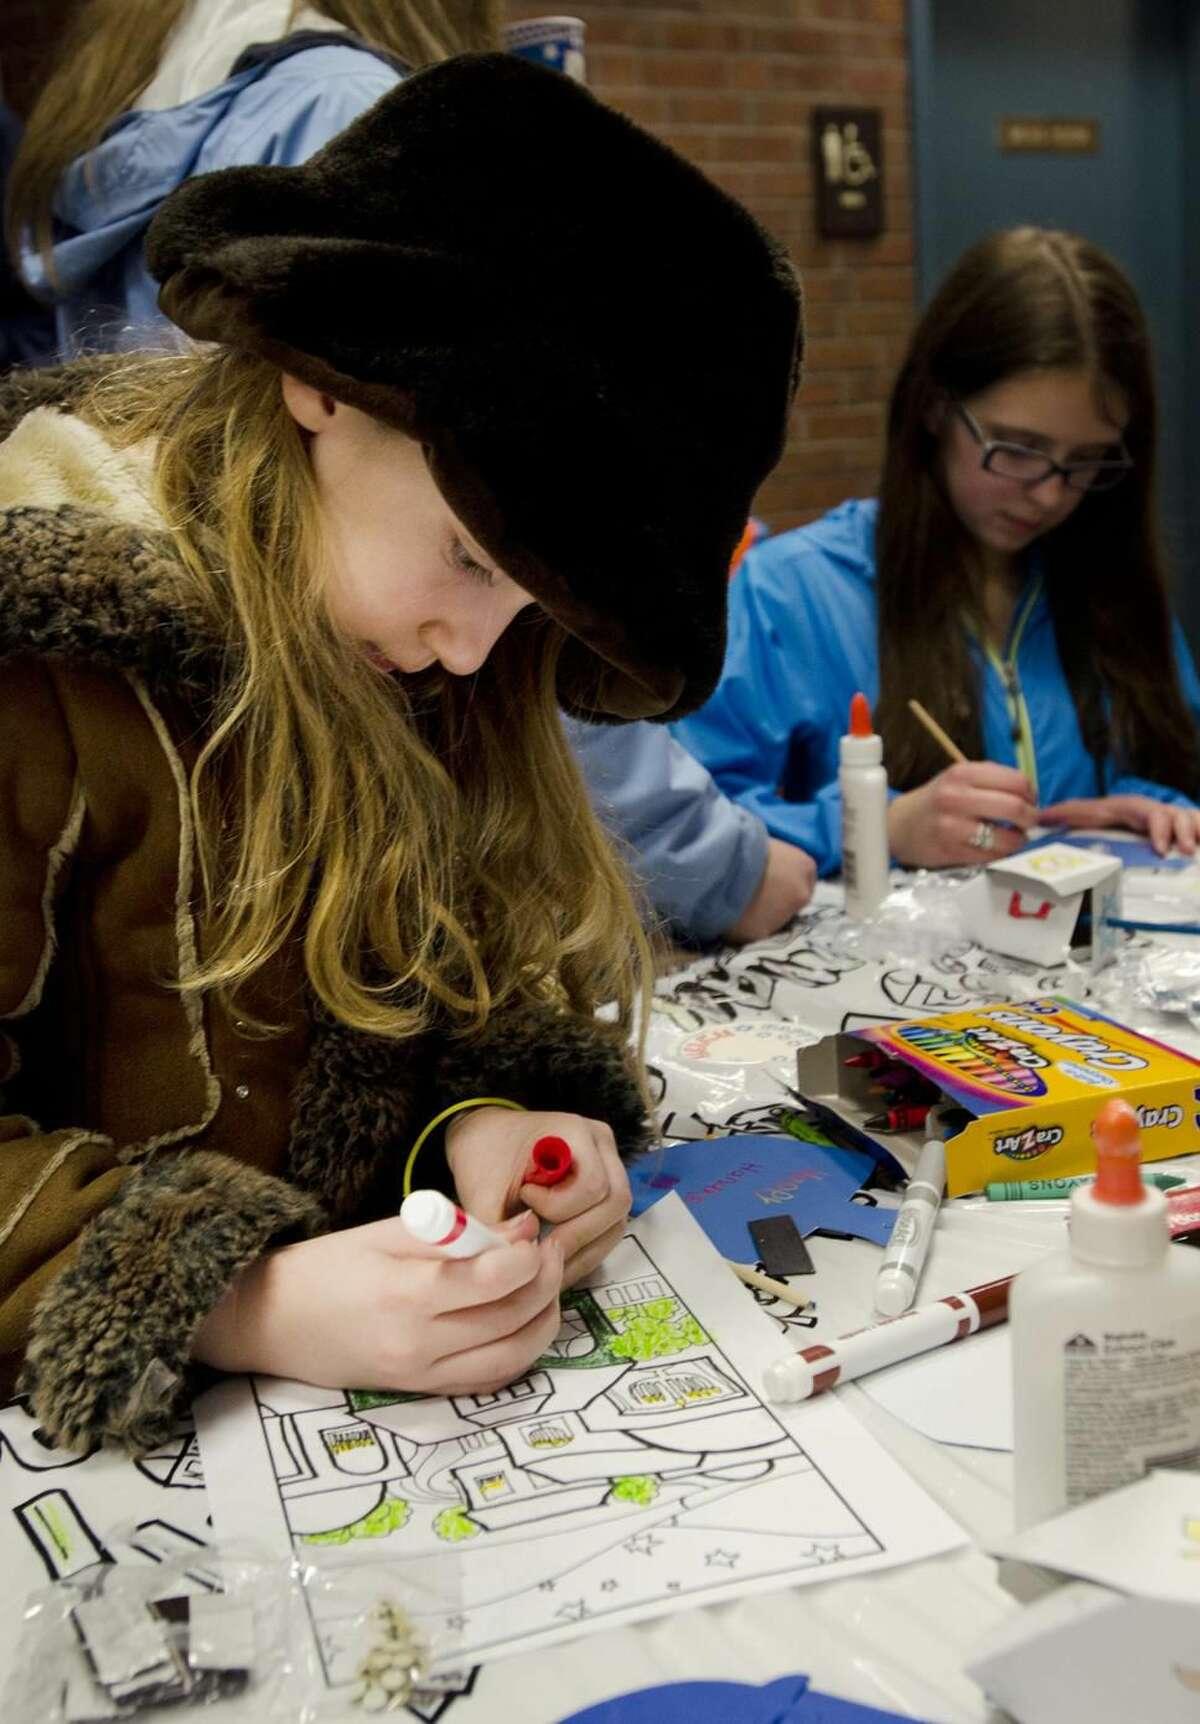 Hamden-Stephanie Caplan,9, of Cheshire, does some coloring during Chanukah festivities at Thorton Wilder Hall. Melanie Stengel/Register